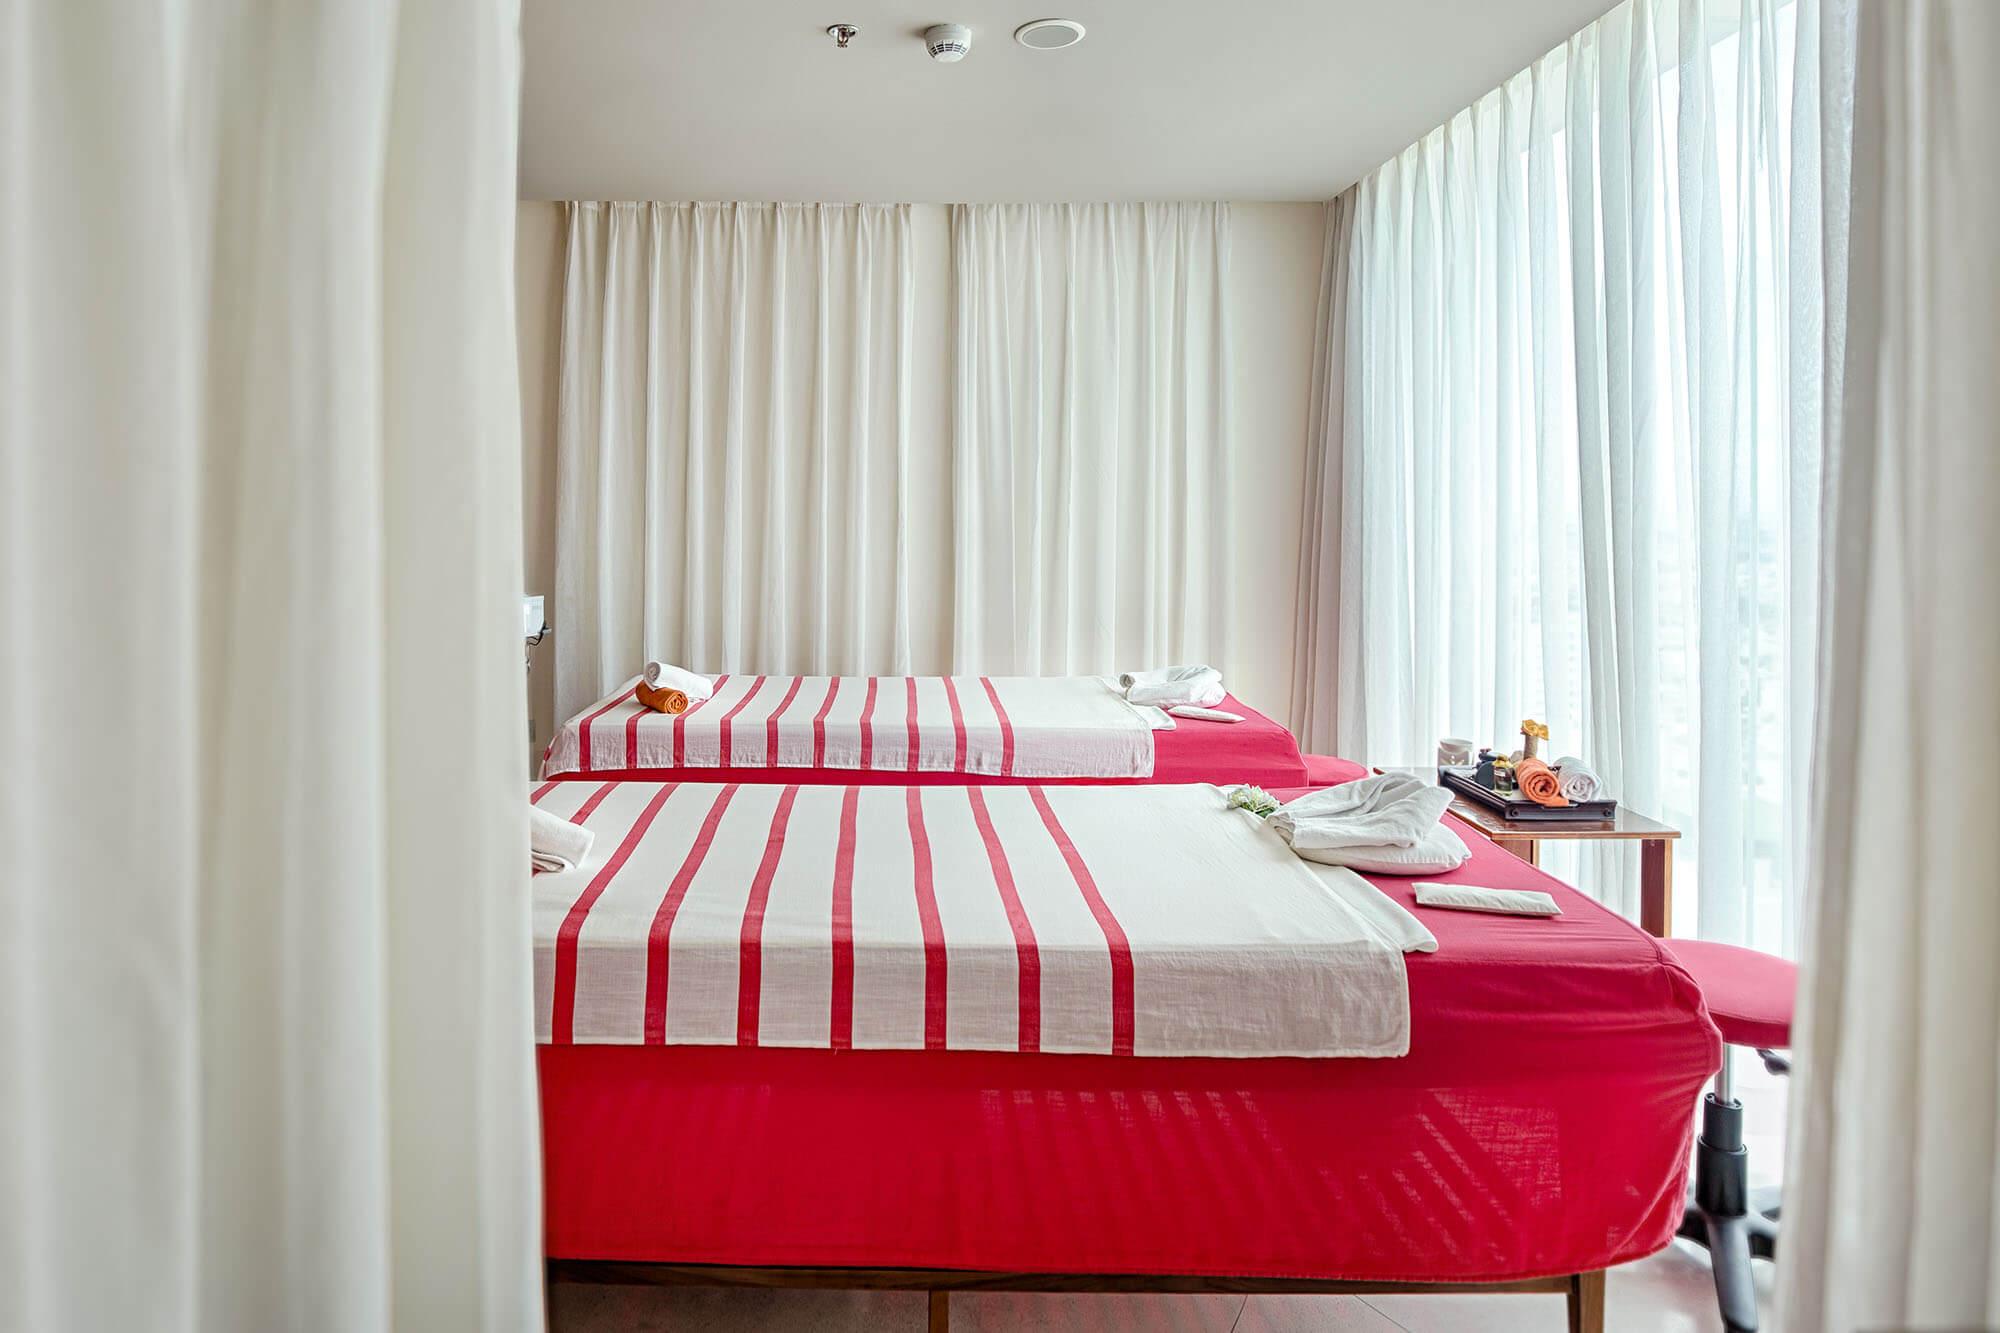 Spice Spa A La Carte Danang Beach Hotel 200 Vo Nguyen Giap Danang Fantasticity Com 02